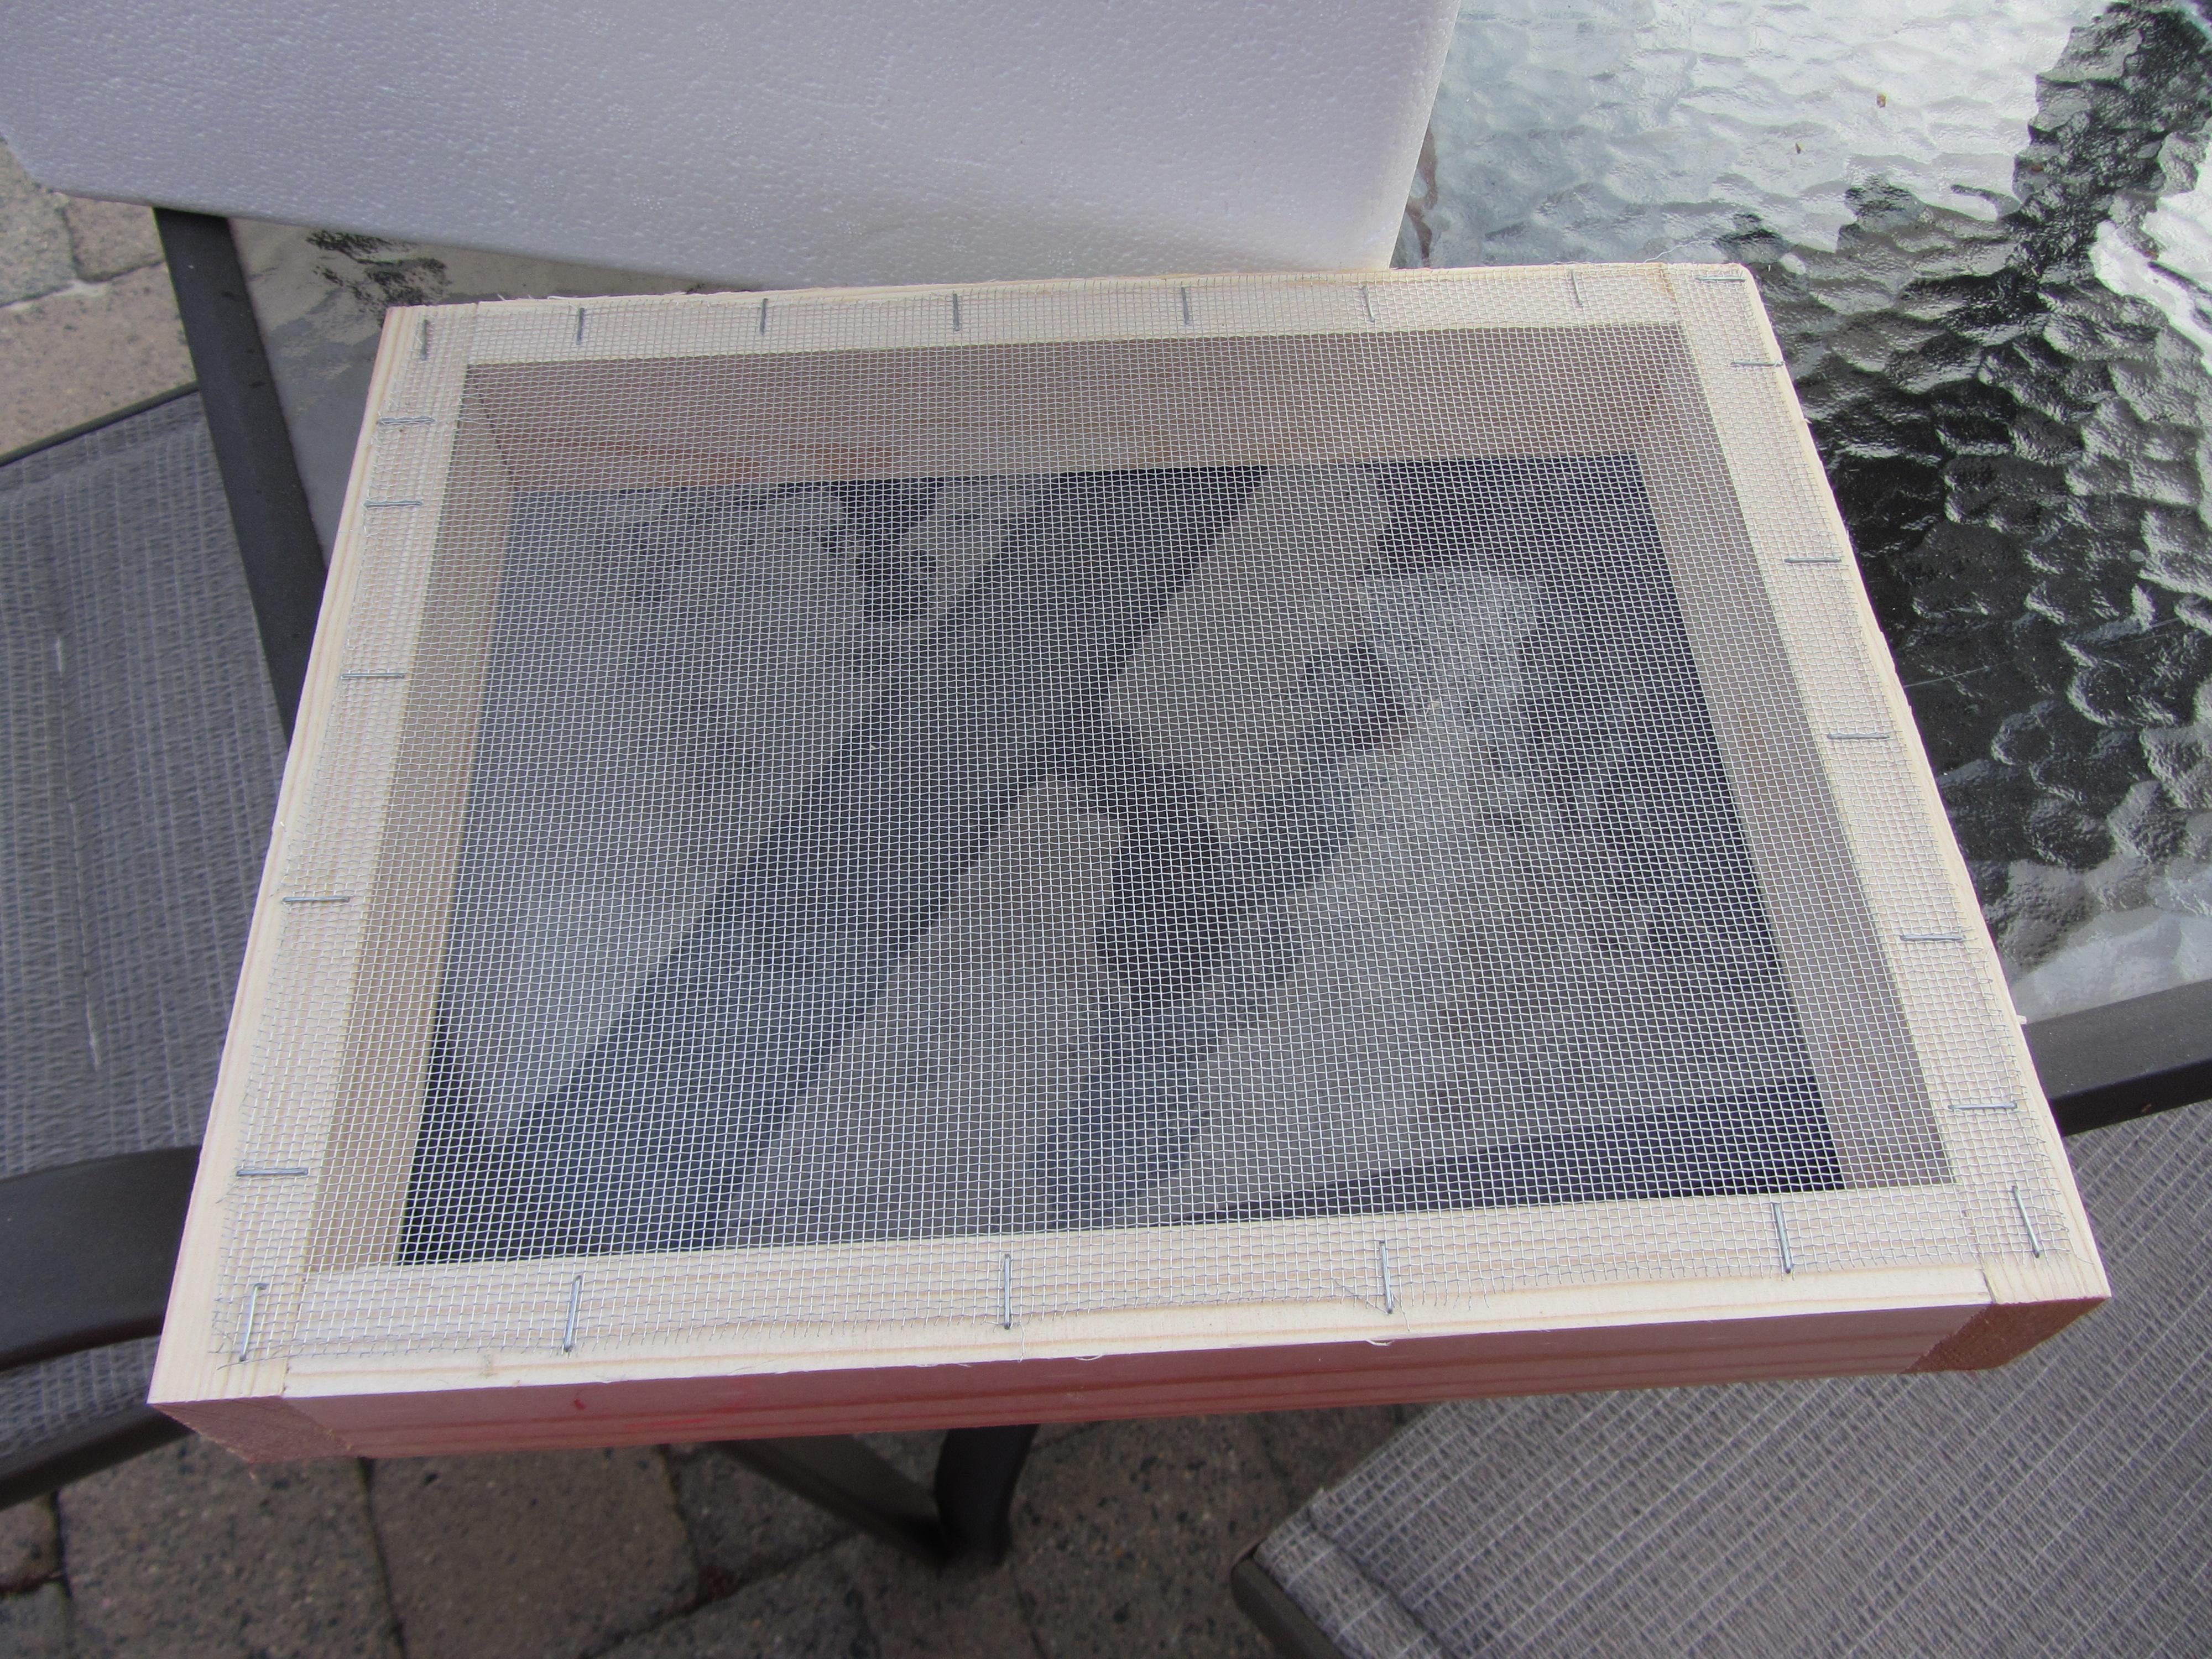 img_4125 we built a wooden frame